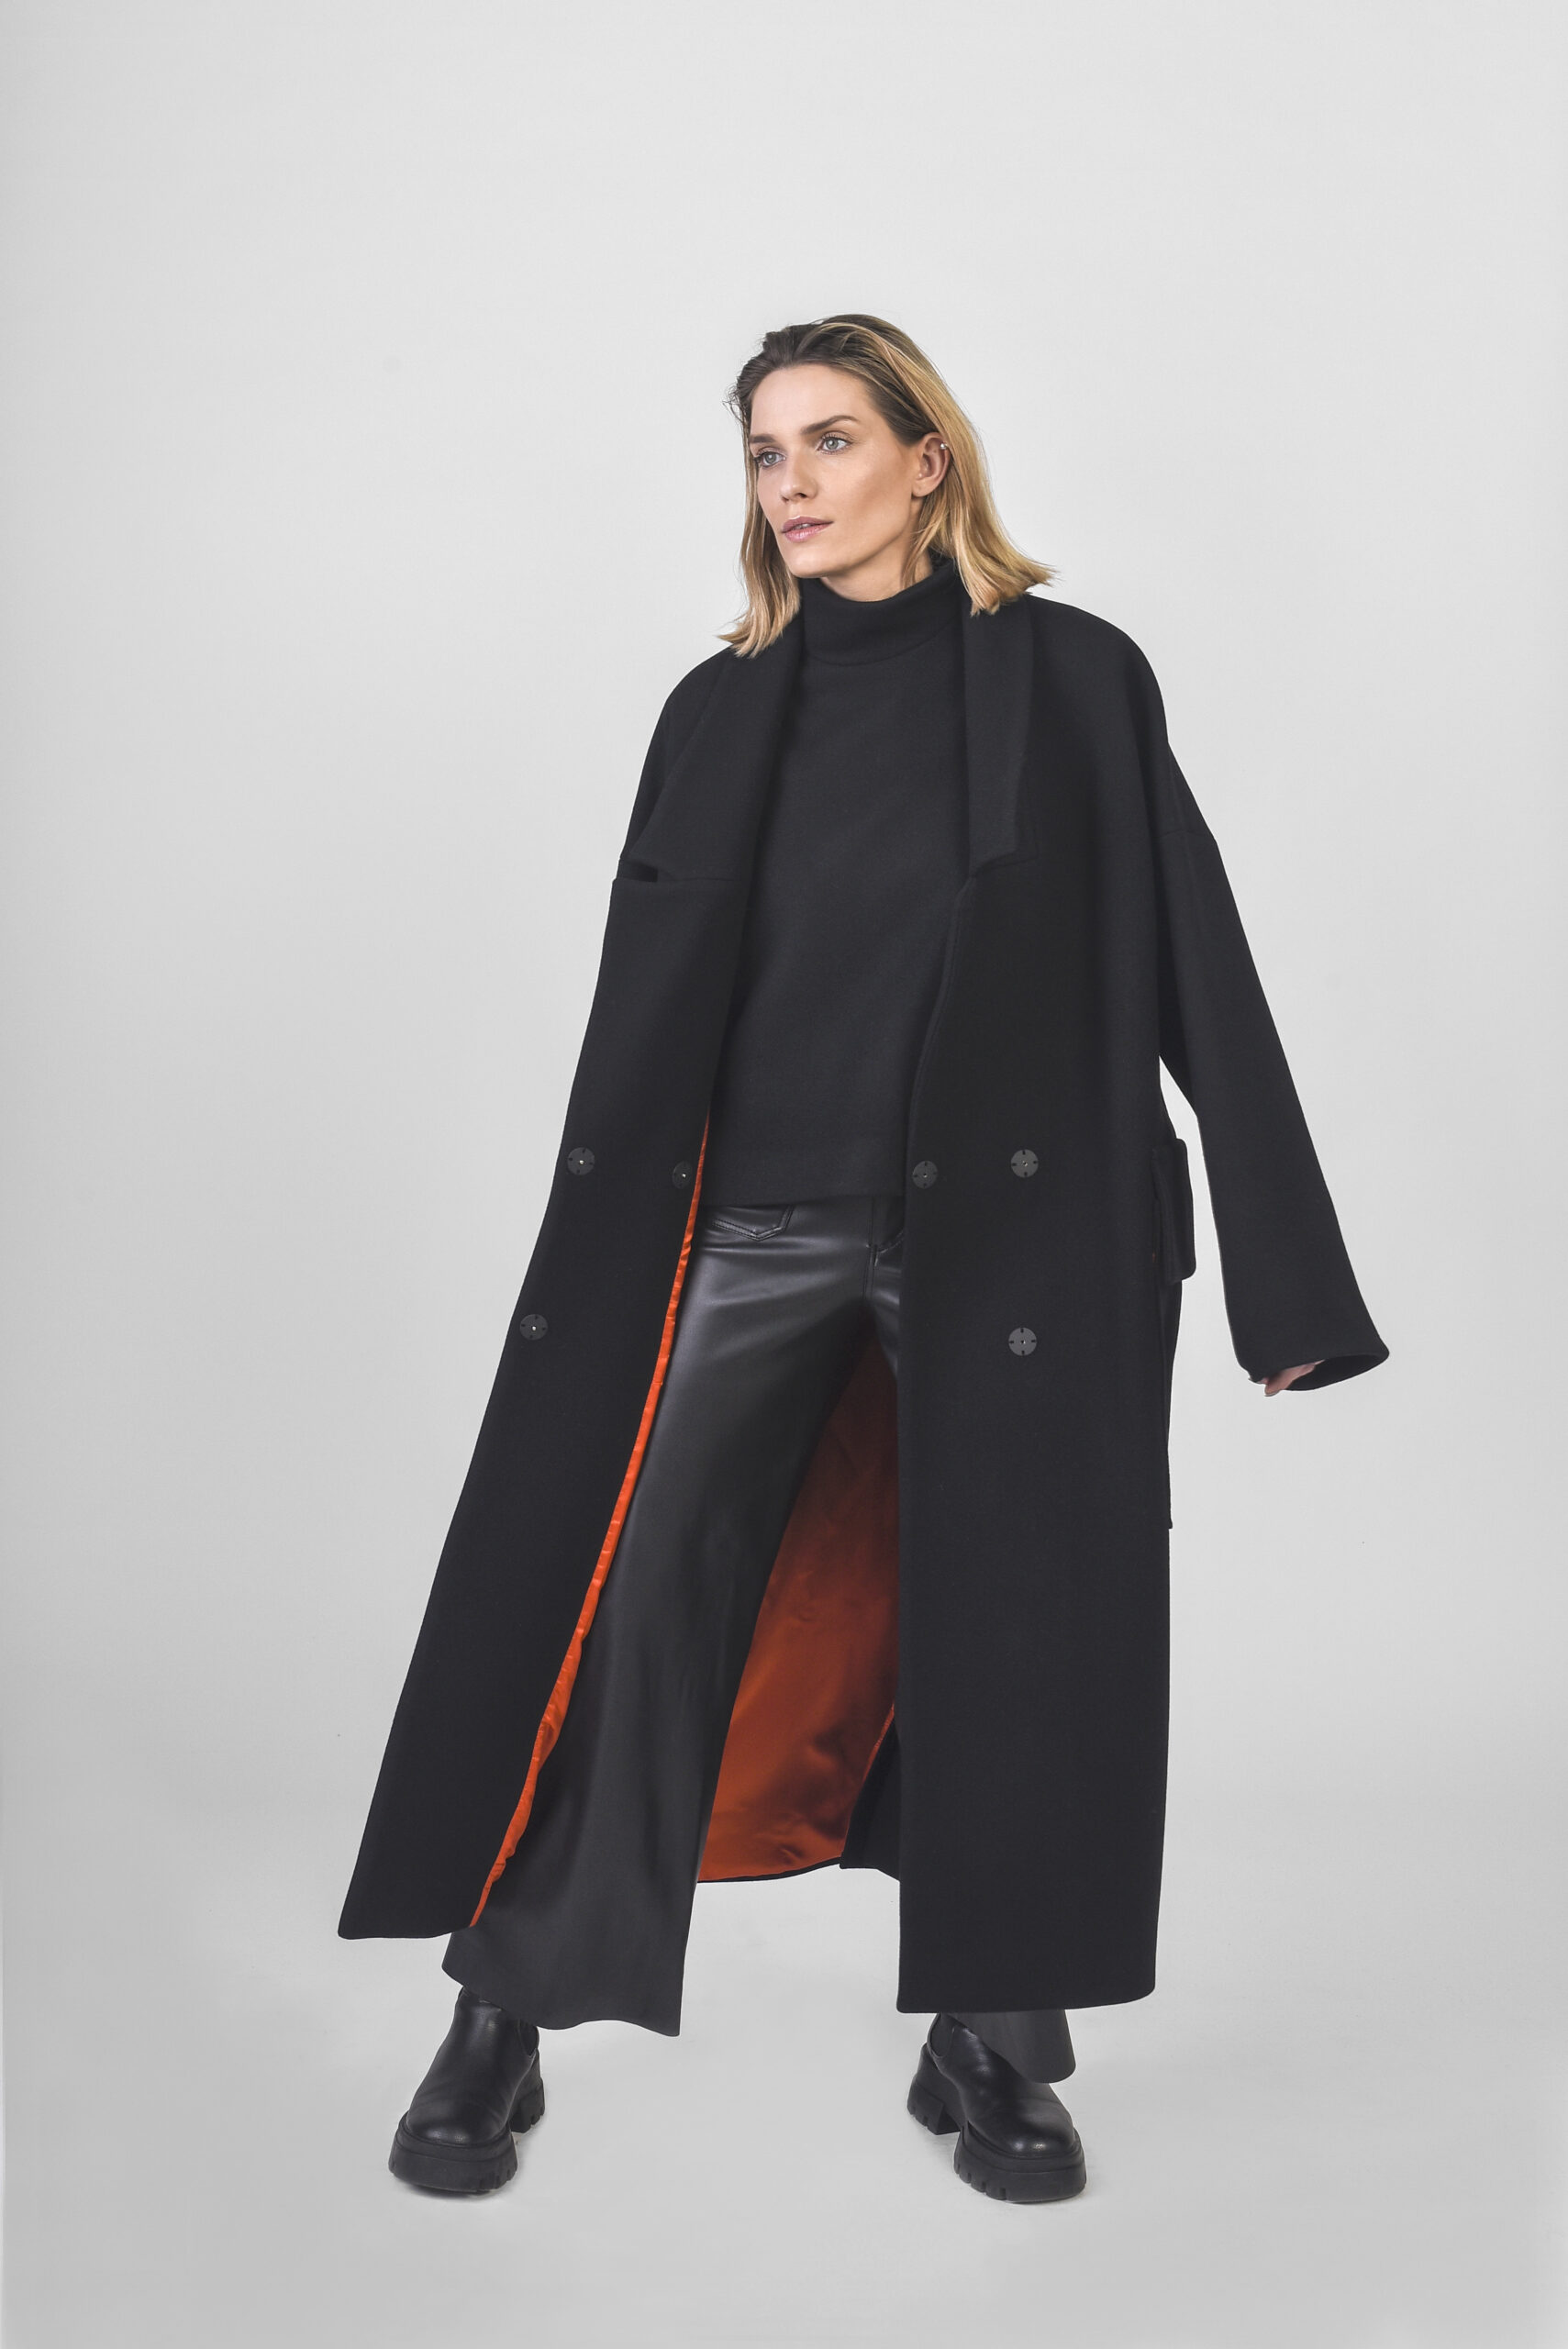 model with black coat and orange linen